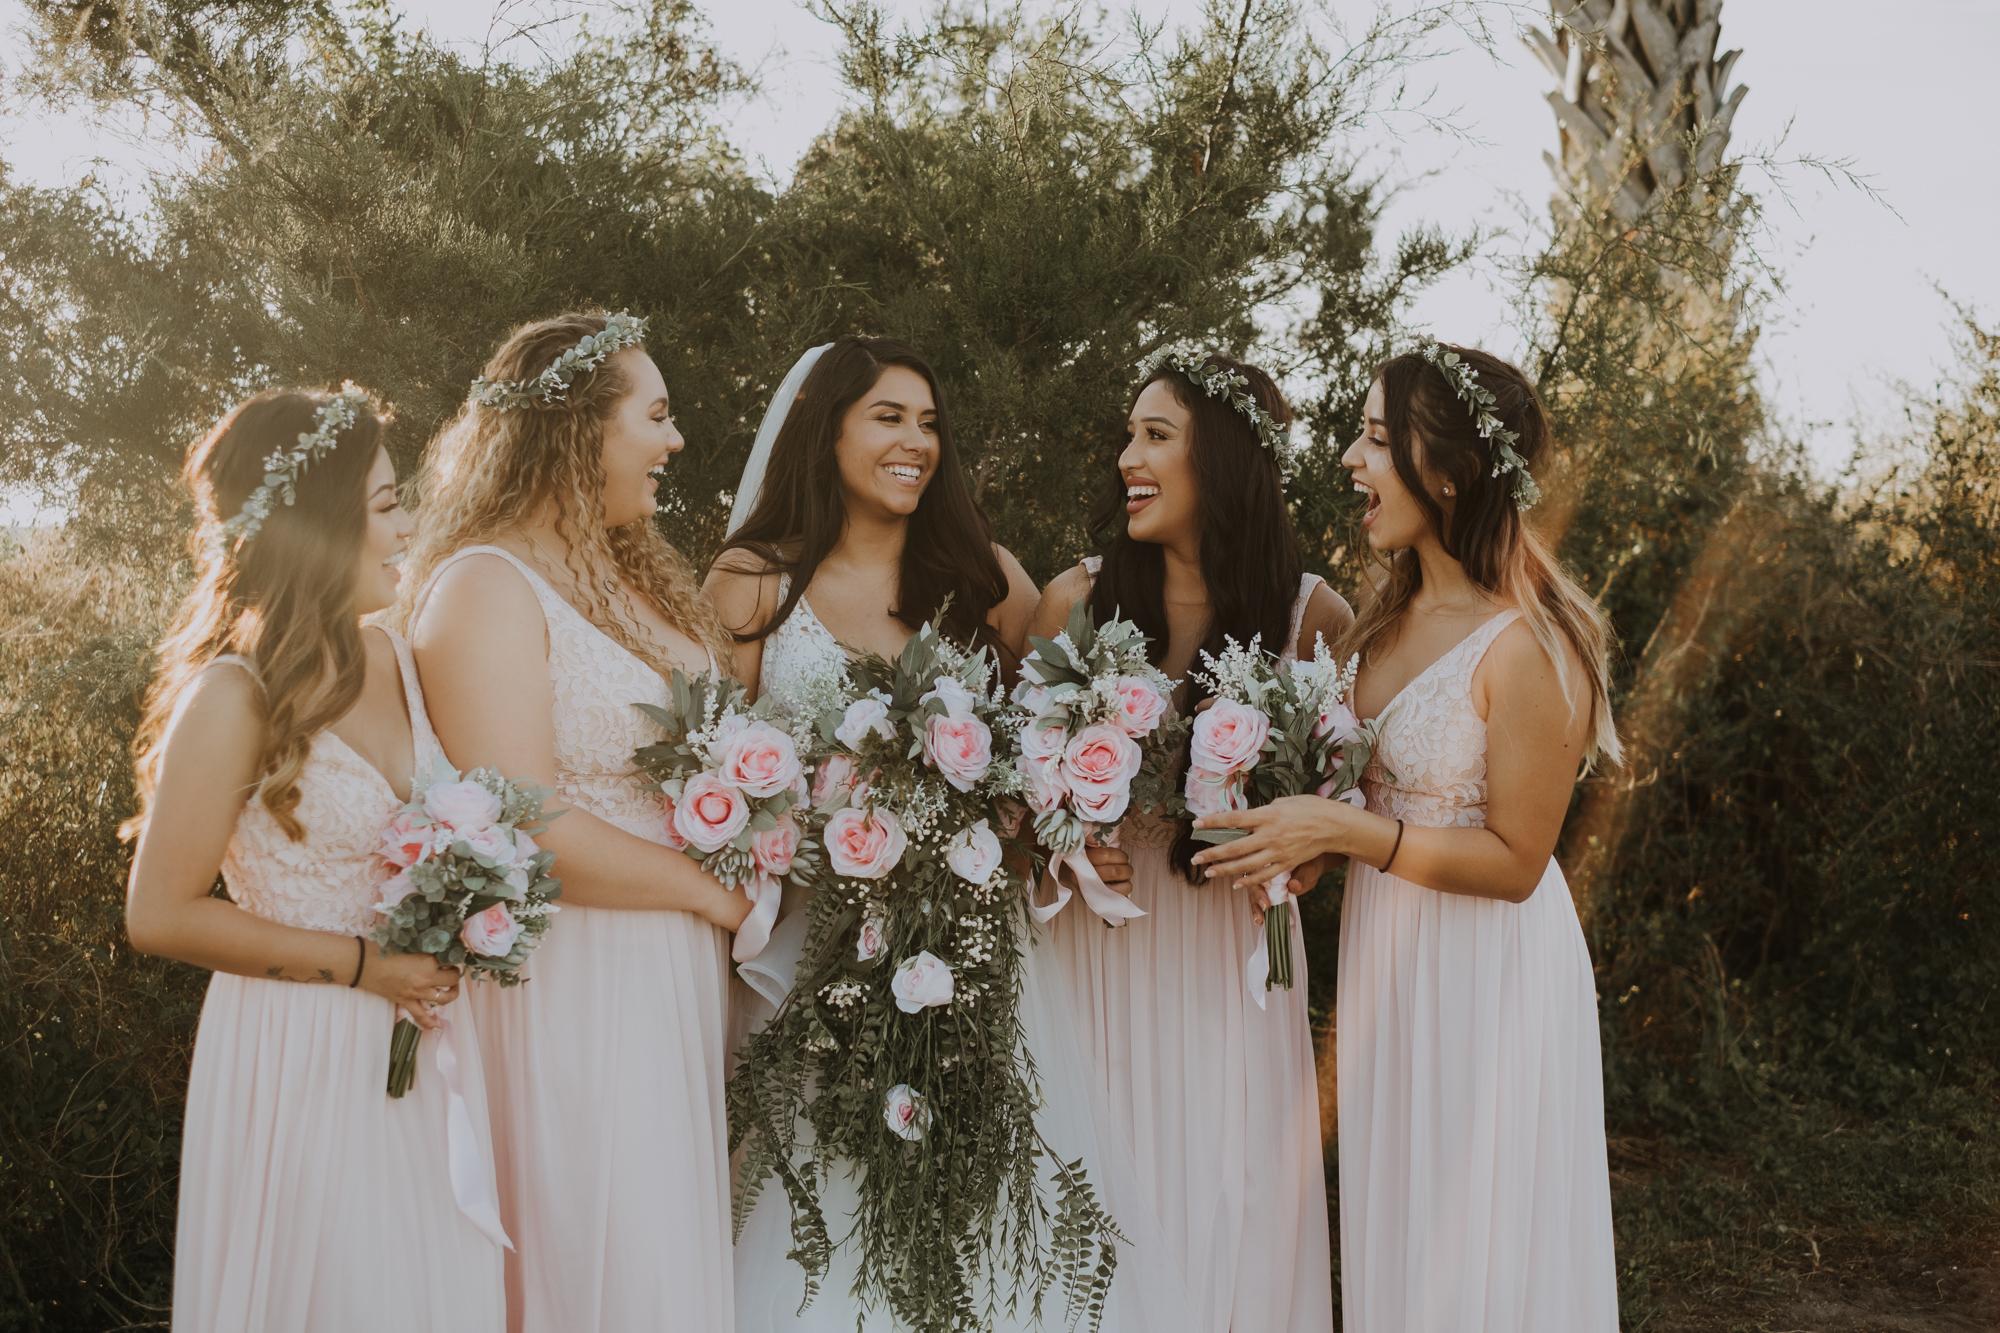 boho bridal party | bridal party portraits | bridesmaid portraits | outdoor Florida wedding | sarasota wedding